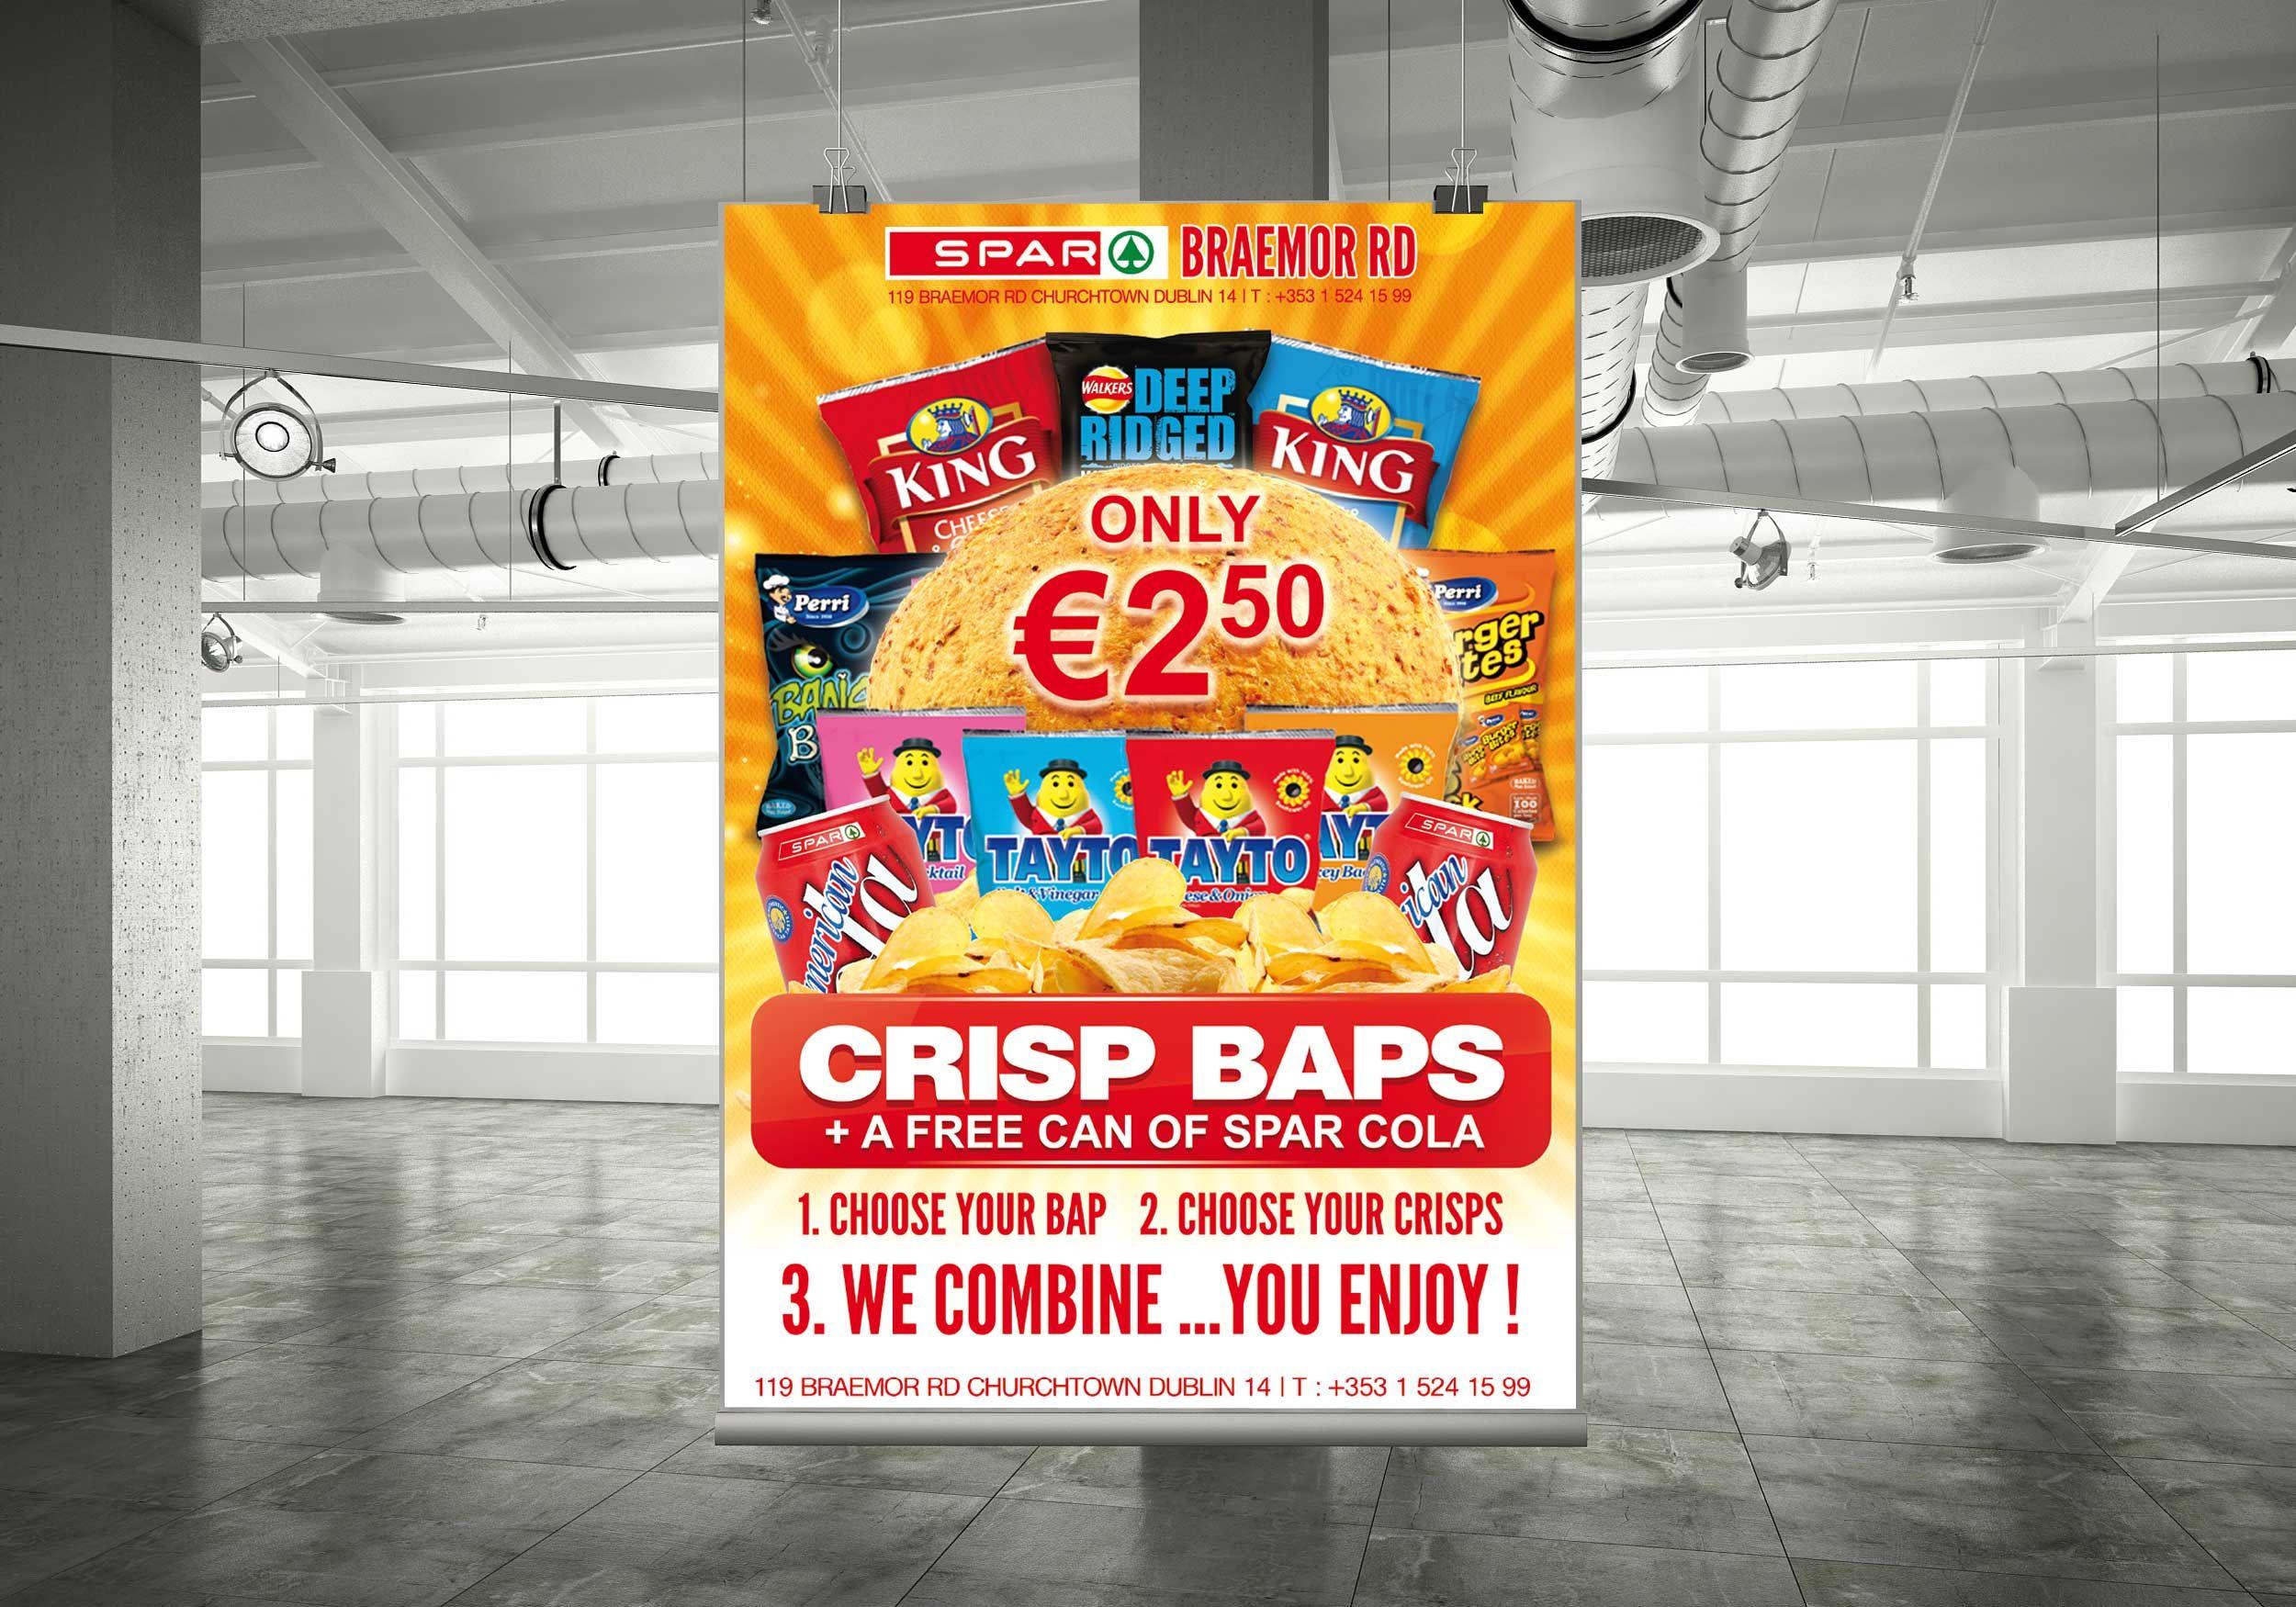 Spar Graphic Design -Companies Dublin Ireland | Graphic ...